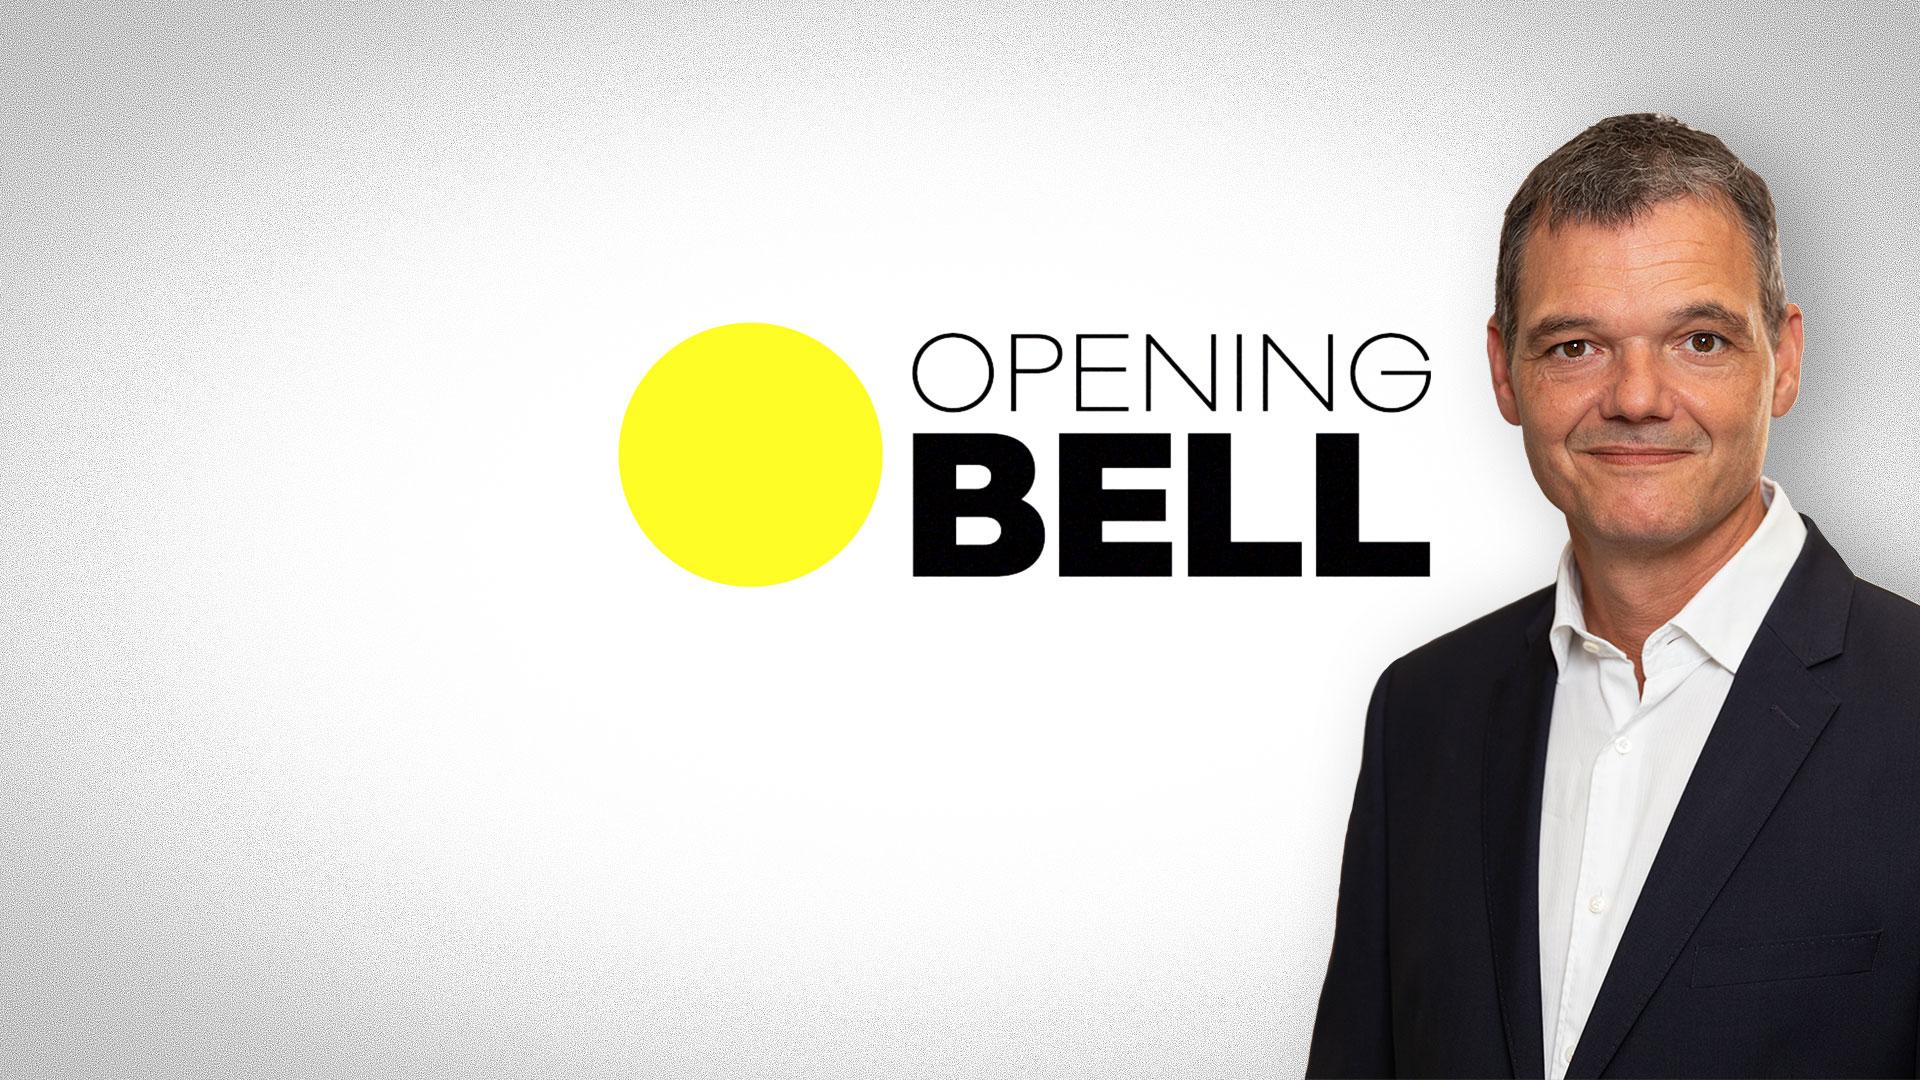 Opening Bell: Dow Jones vor dreistelligem Plus; Novavax, Gilead Sciences, Microsoft, Amazon, Facebook